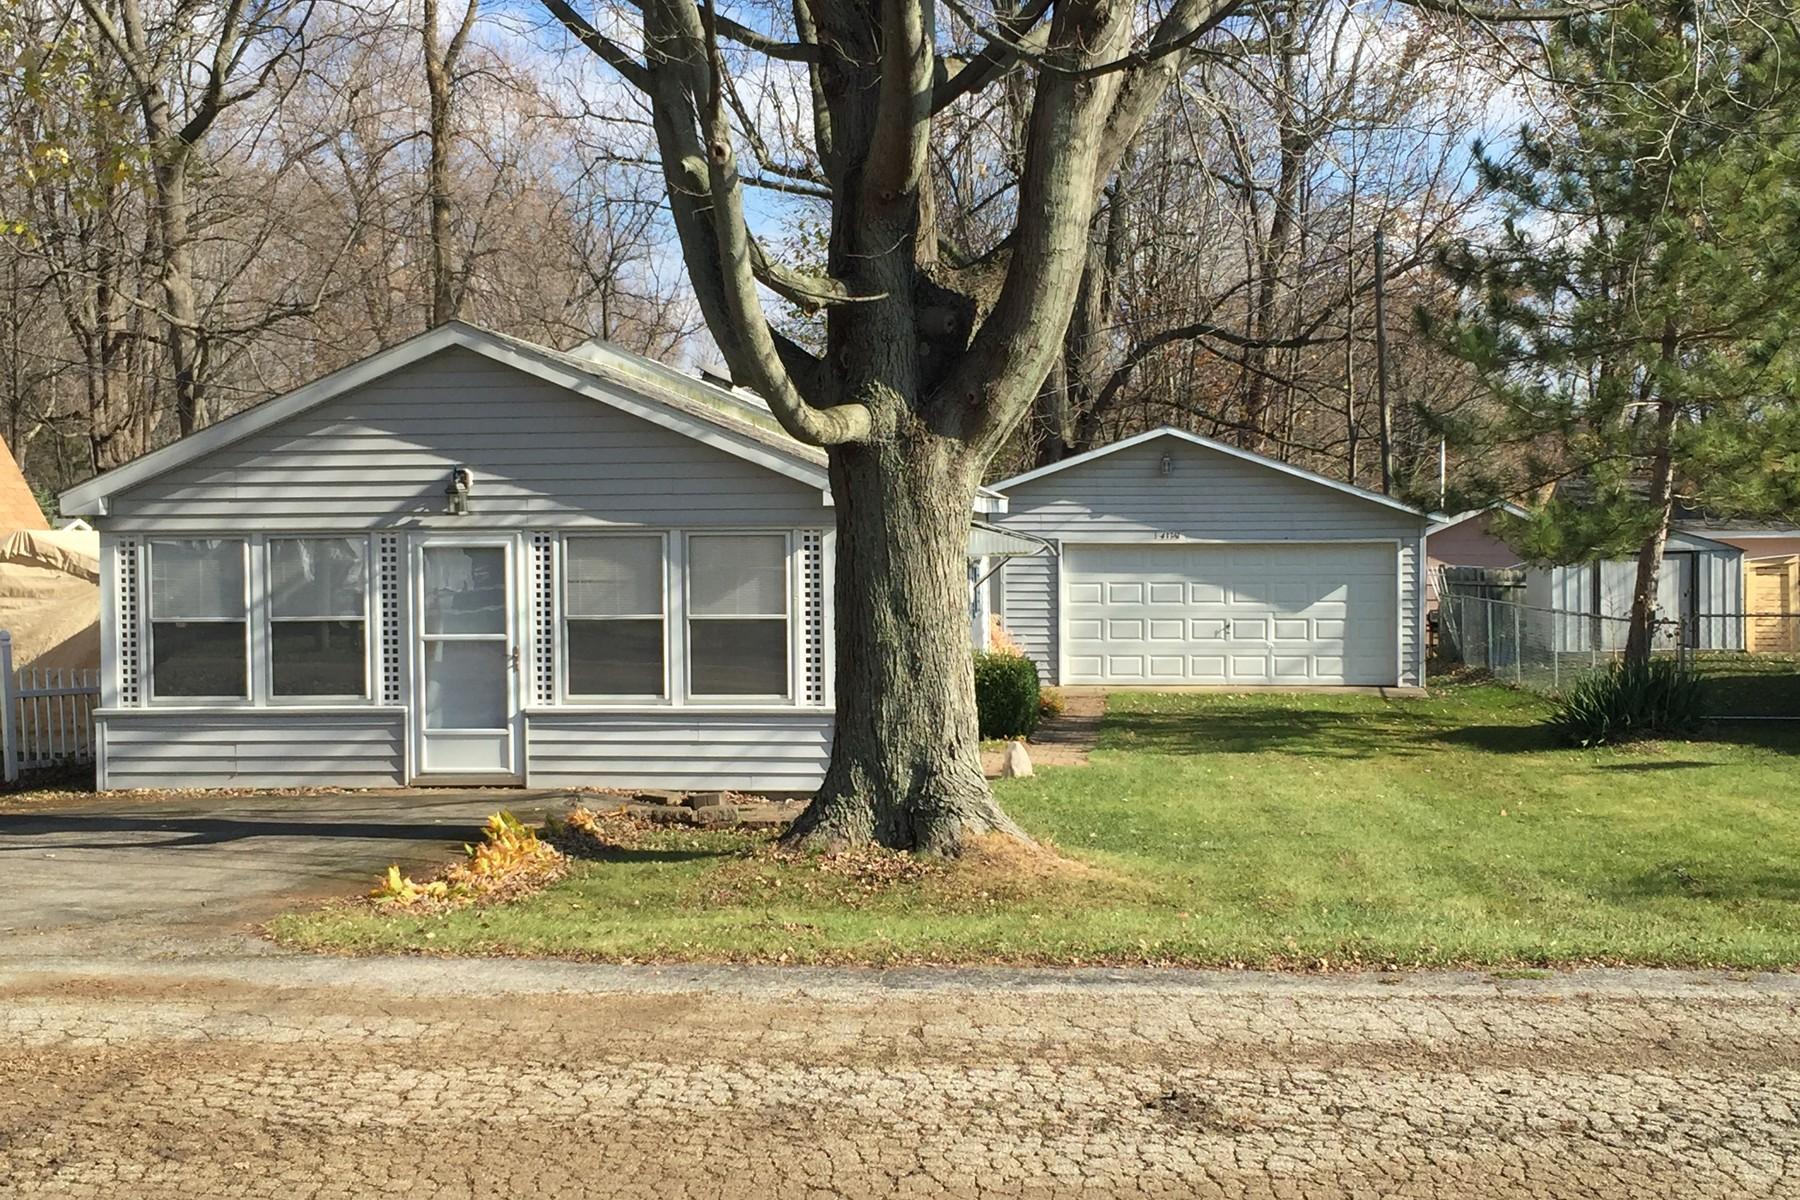 Villa per Vendita alle ore Cute Cottage 43361 Van Auken Drive Bangor, Michigan, 49013 Stati Uniti